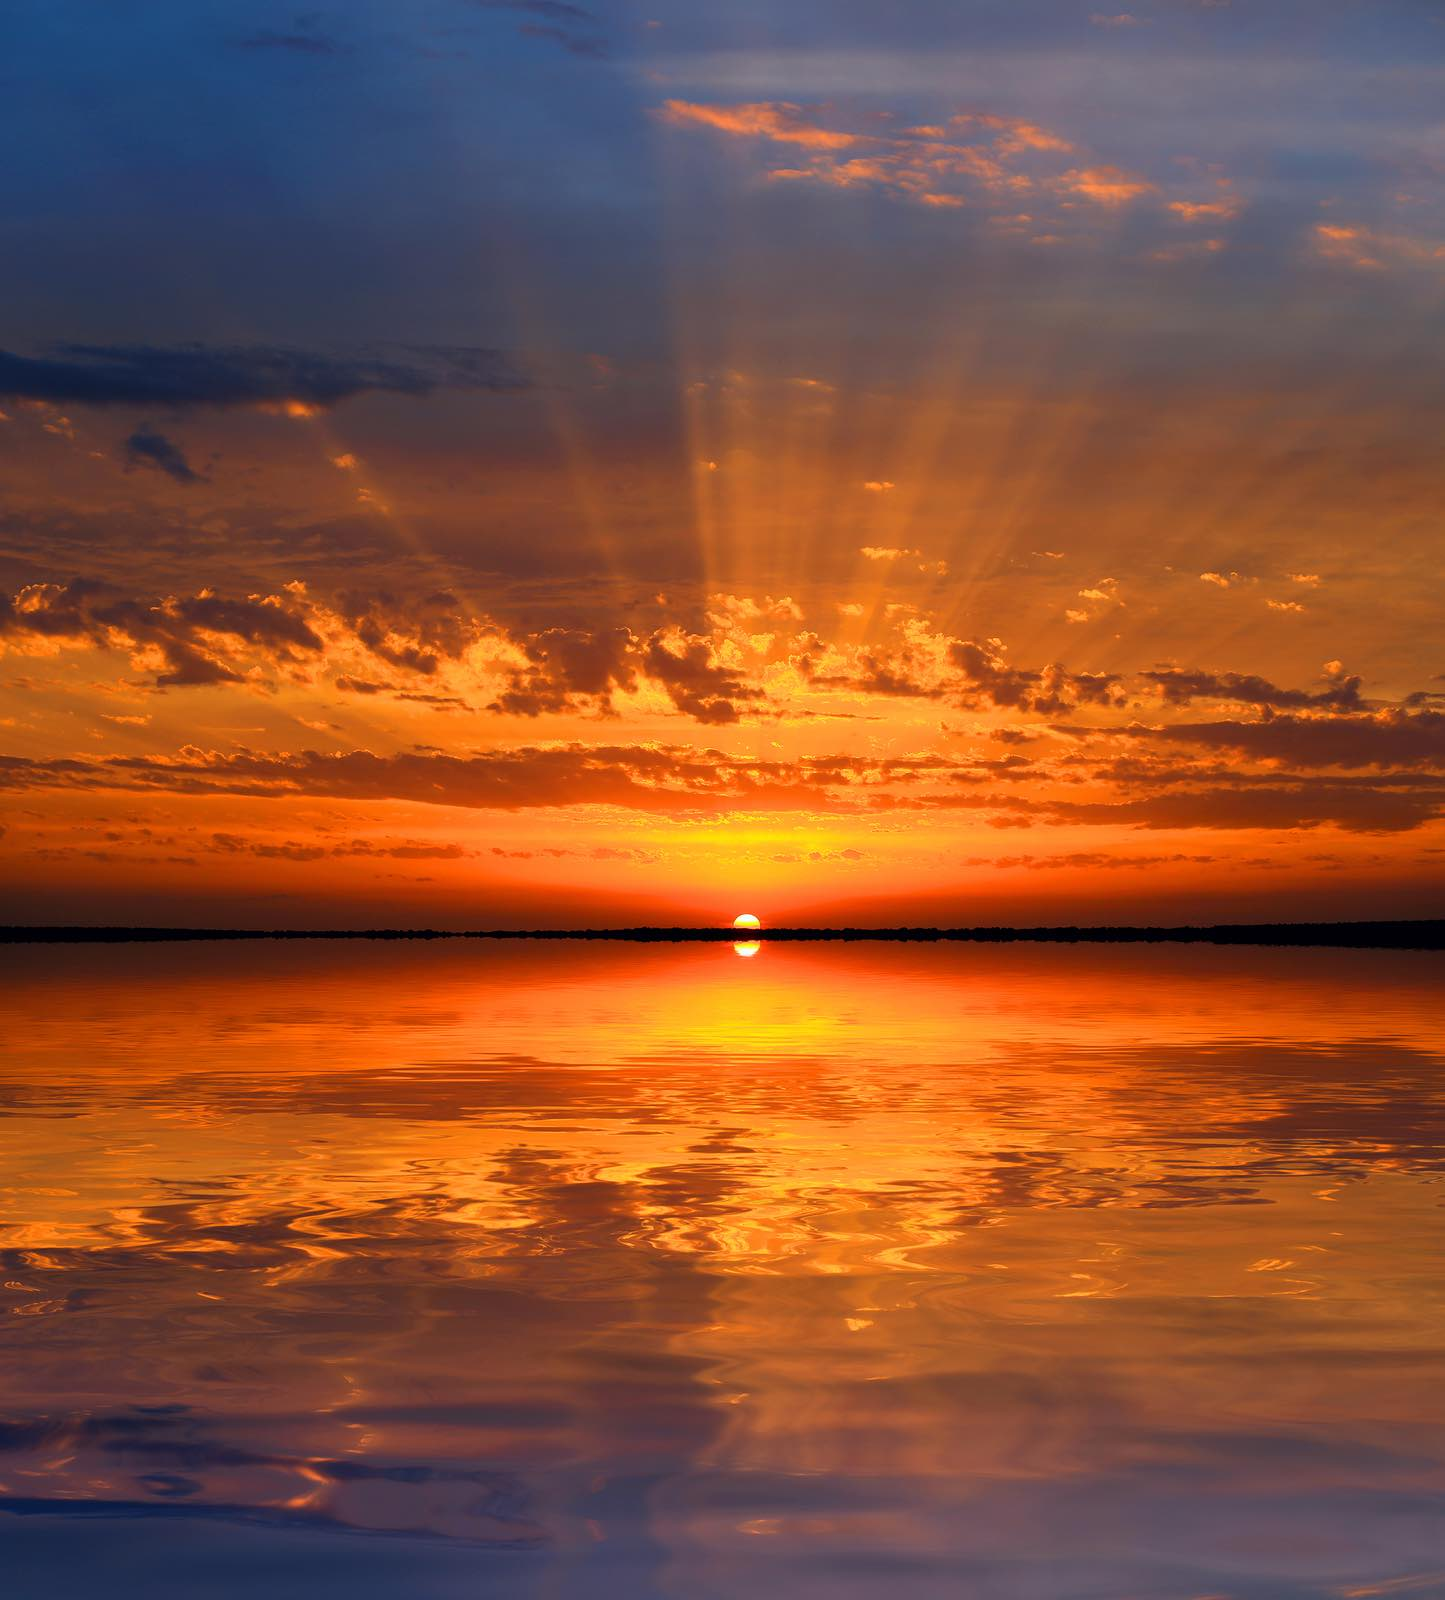 bigstock-Nice-sunset-over-lake-surface-46935337 copy